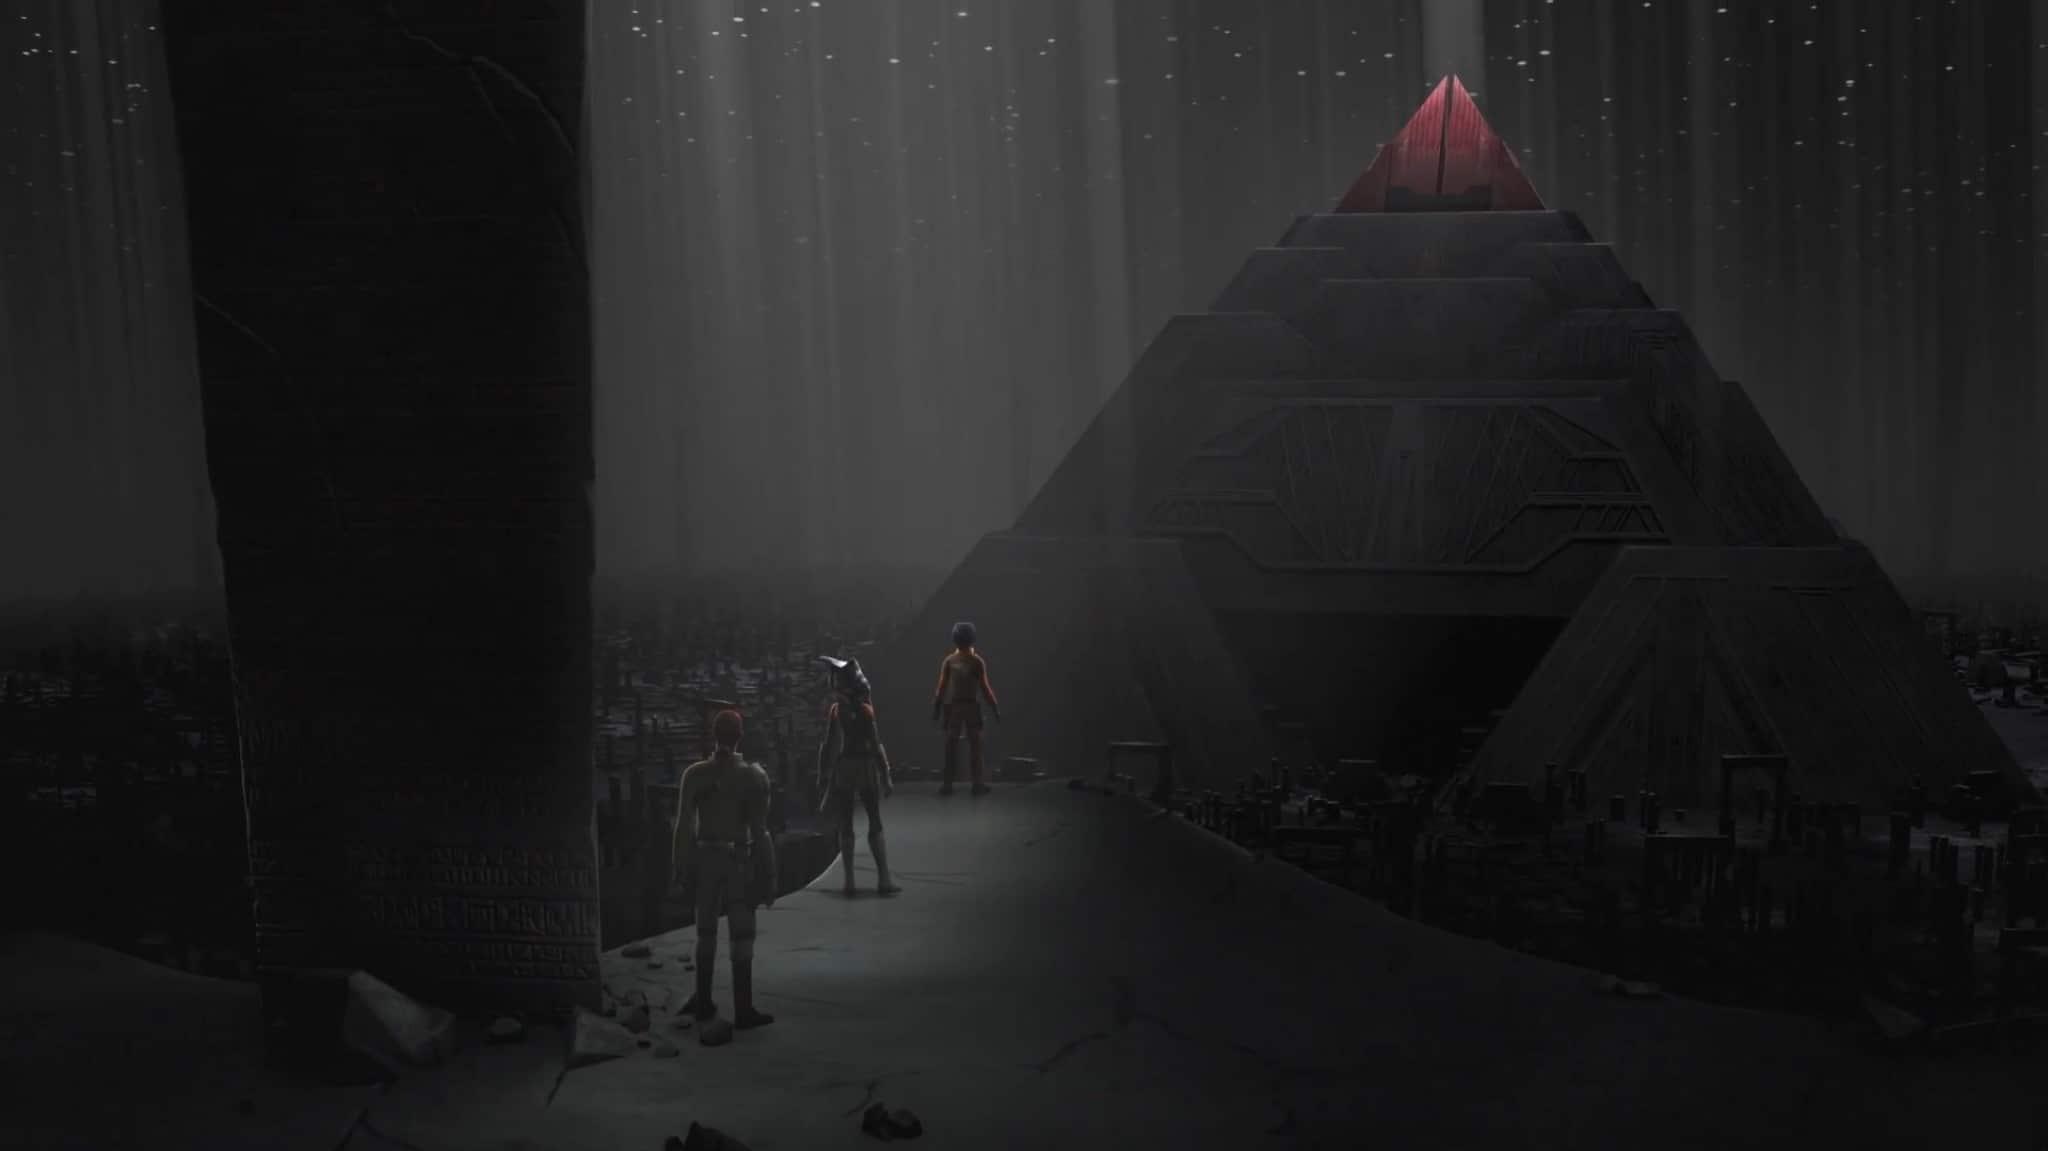 Malachor – Star Wars Rebels